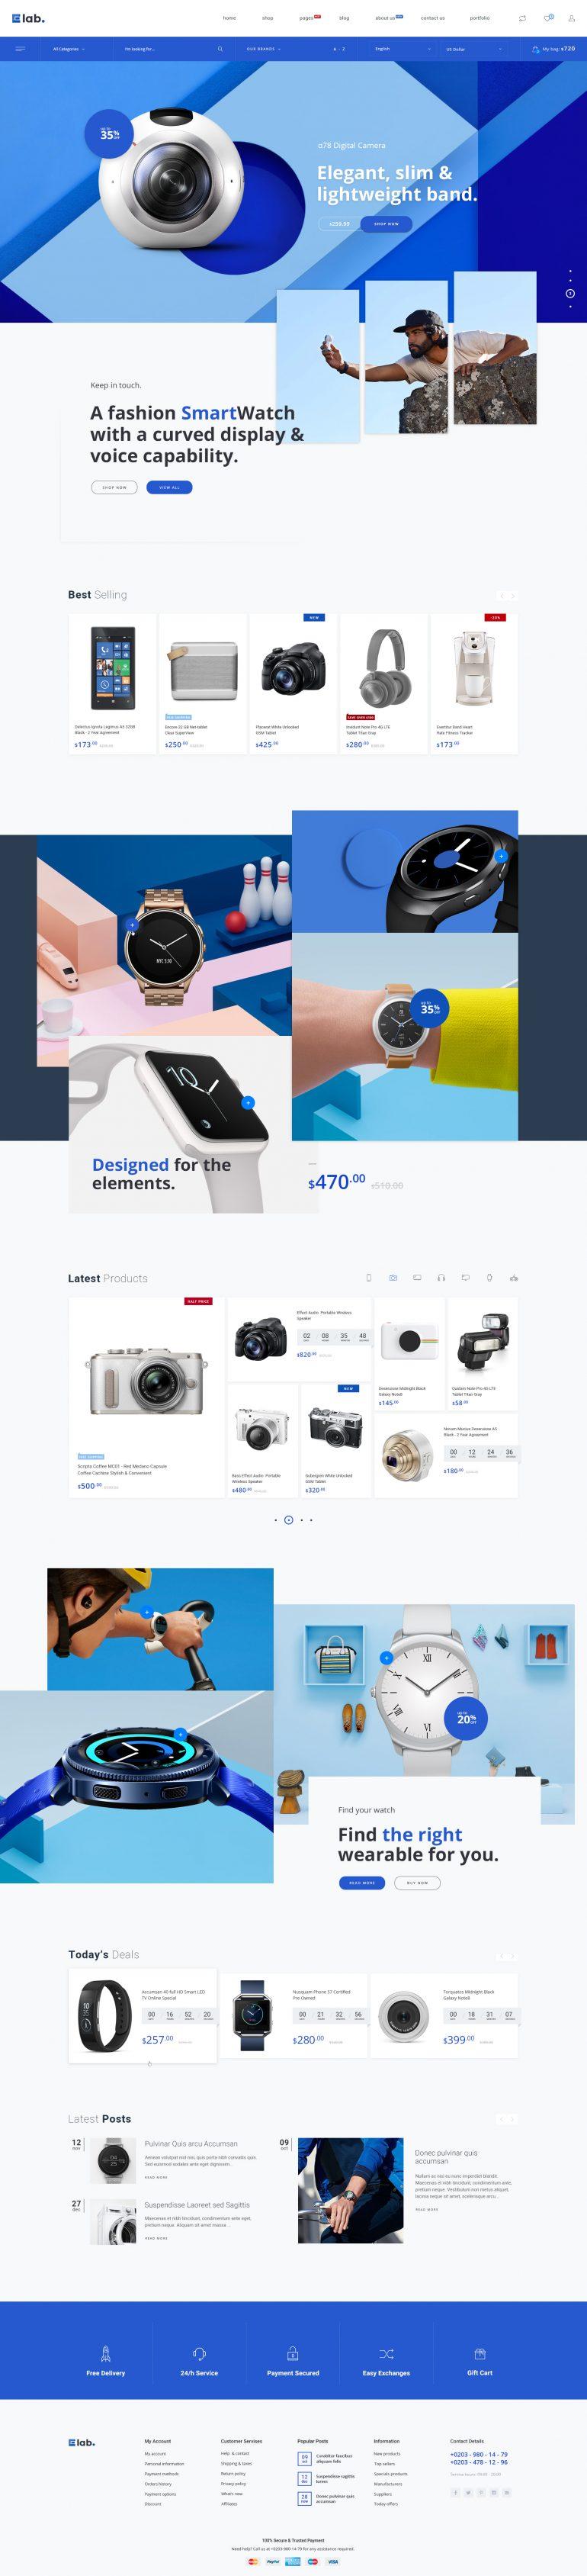 E-lab – eCommerce PSD Template by MarekMnishek